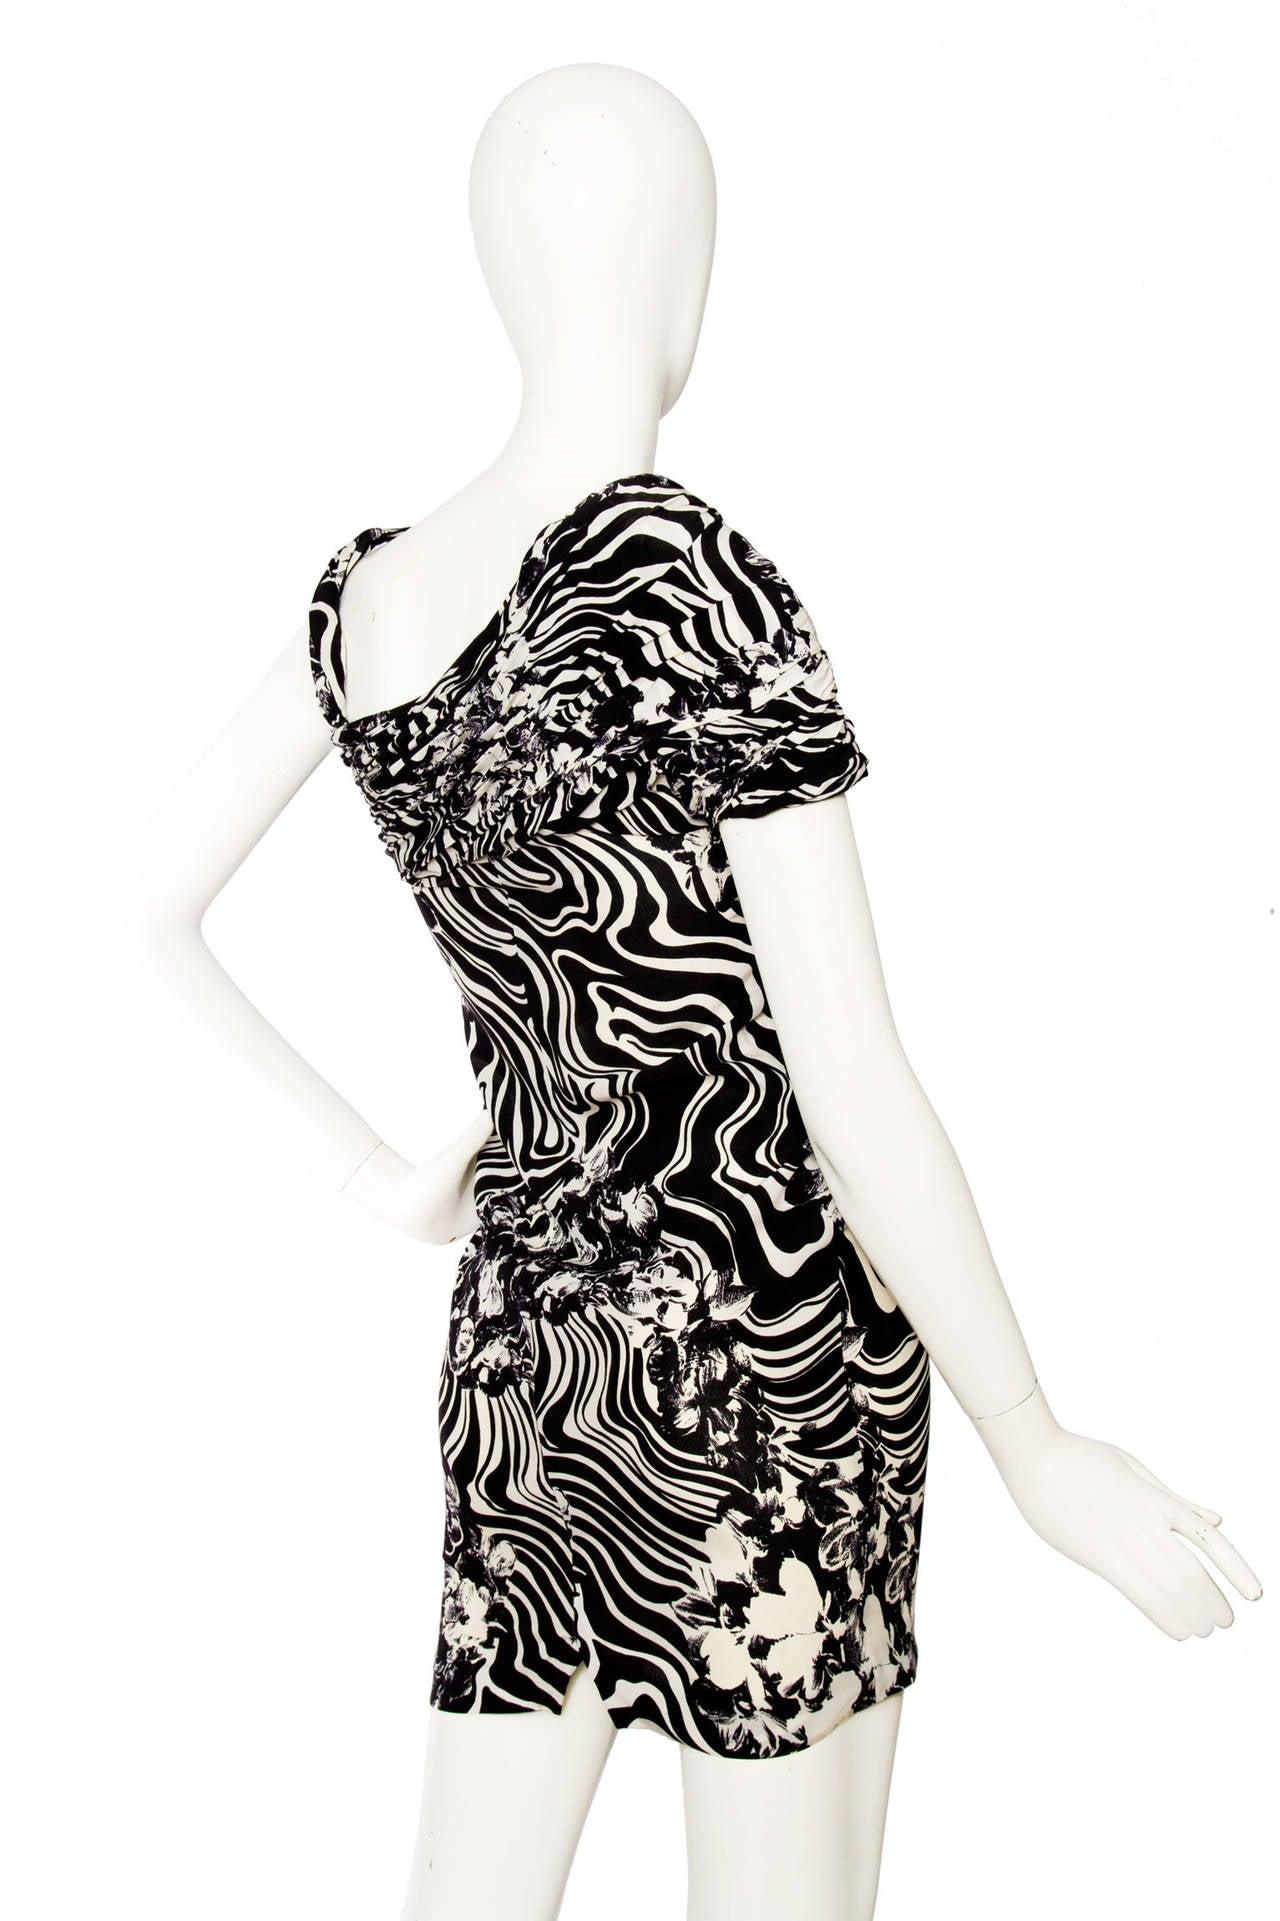 1980s Gianni Versace Monochrome Silk Dress 5